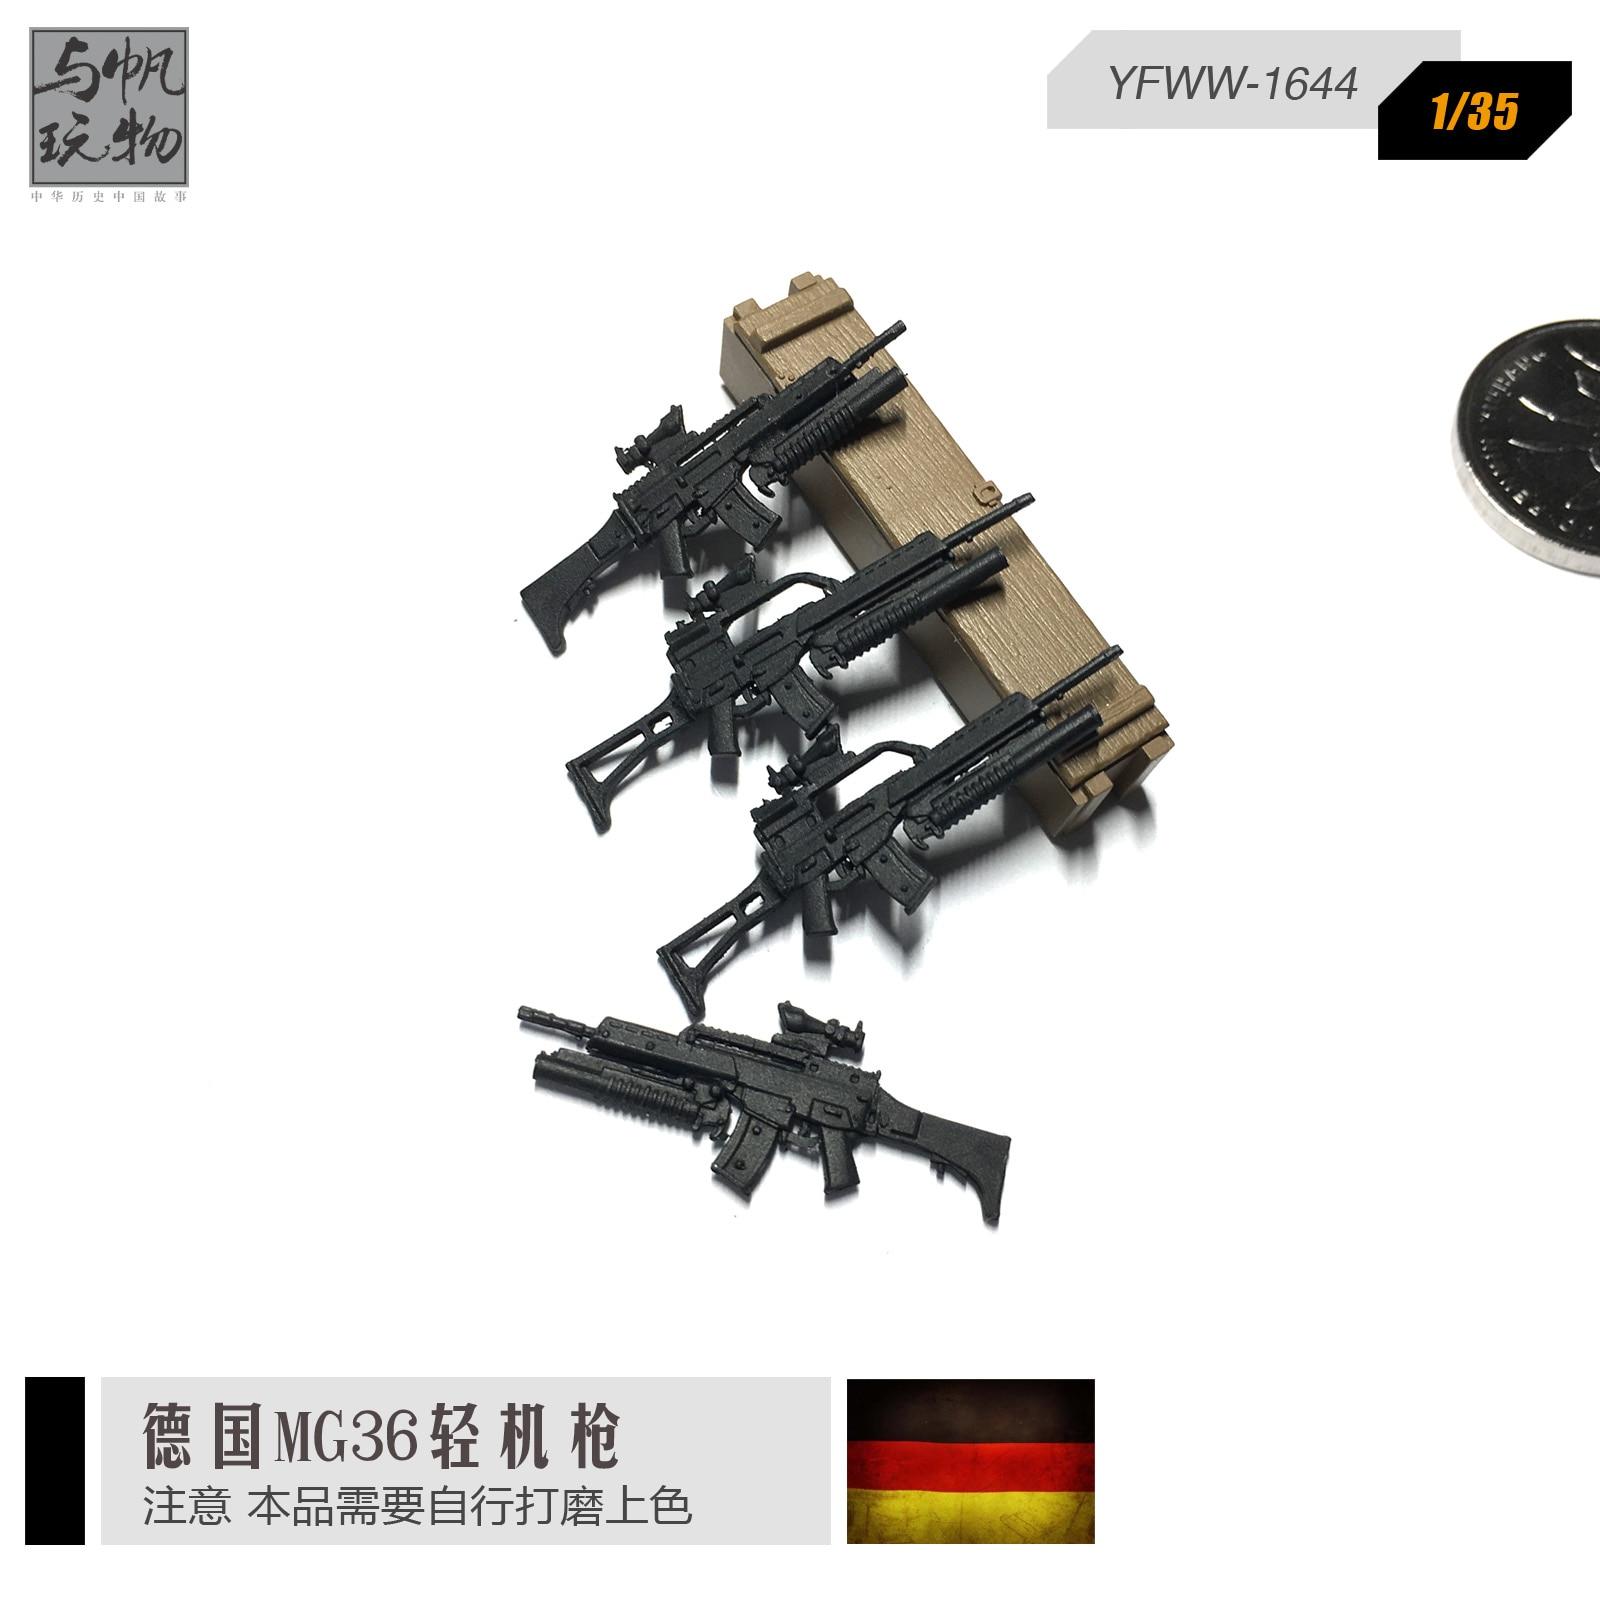 1/35 German MG36 light machine gun model 4 sets of weapons ... | 1600 x 1600 jpeg 179kB